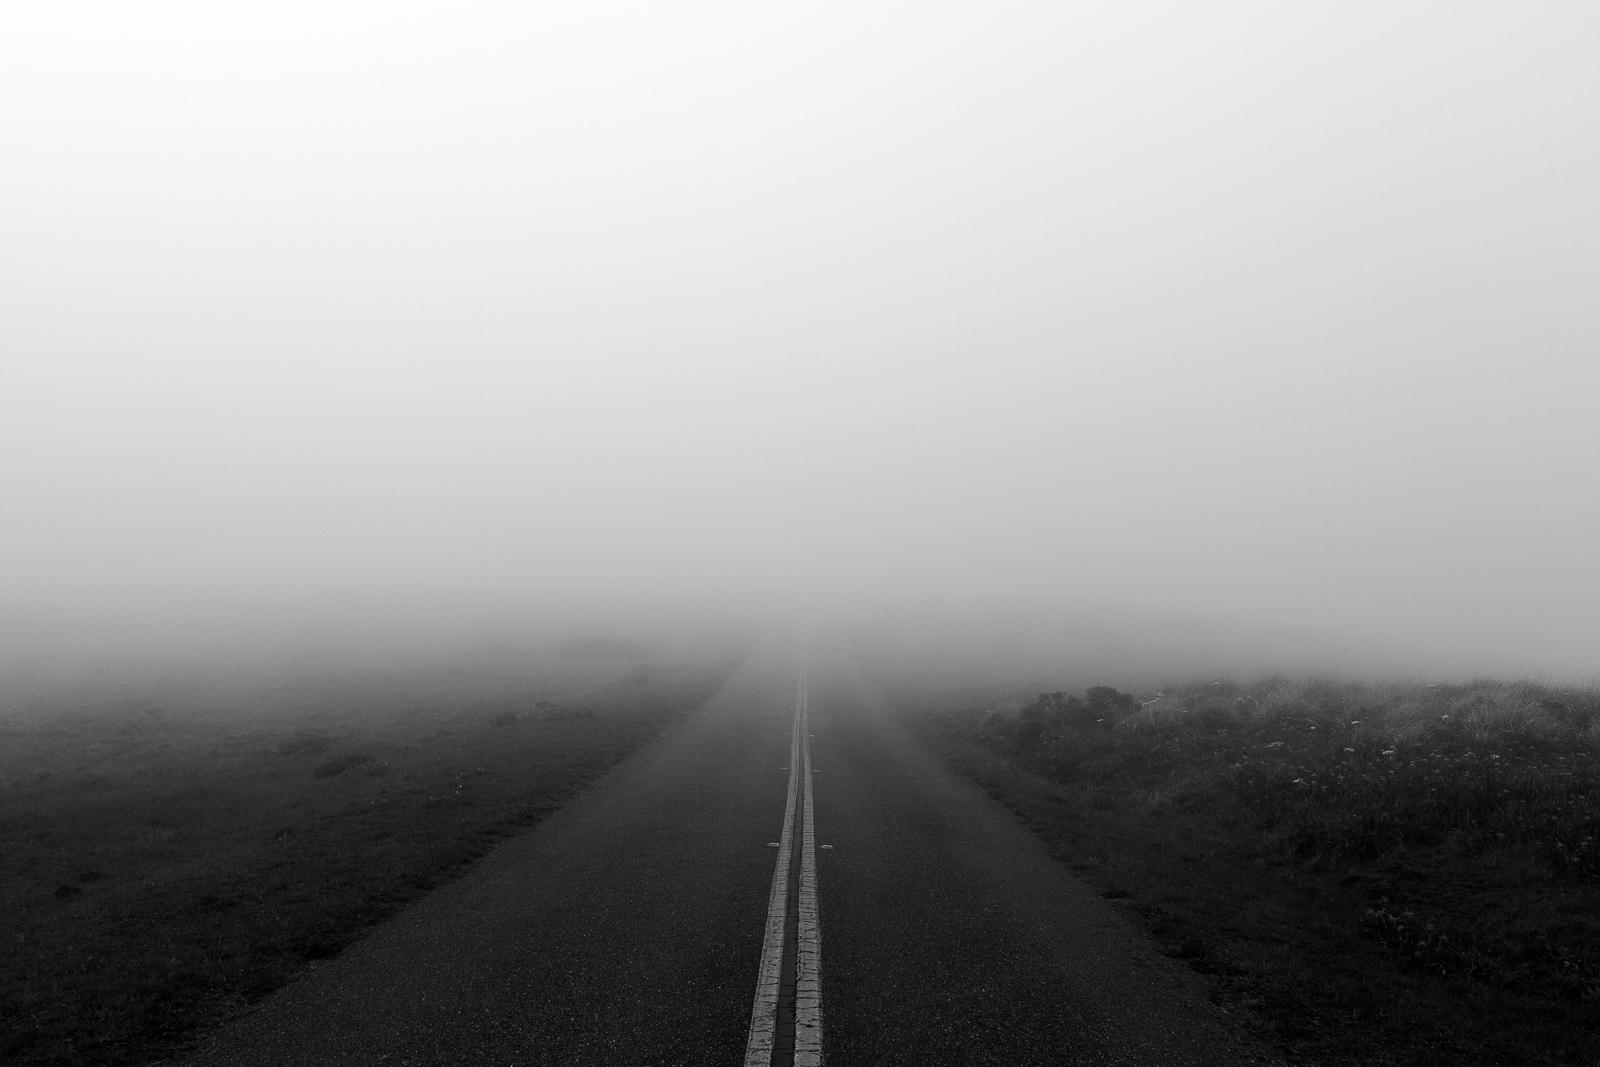 JC_Road-1.jpg